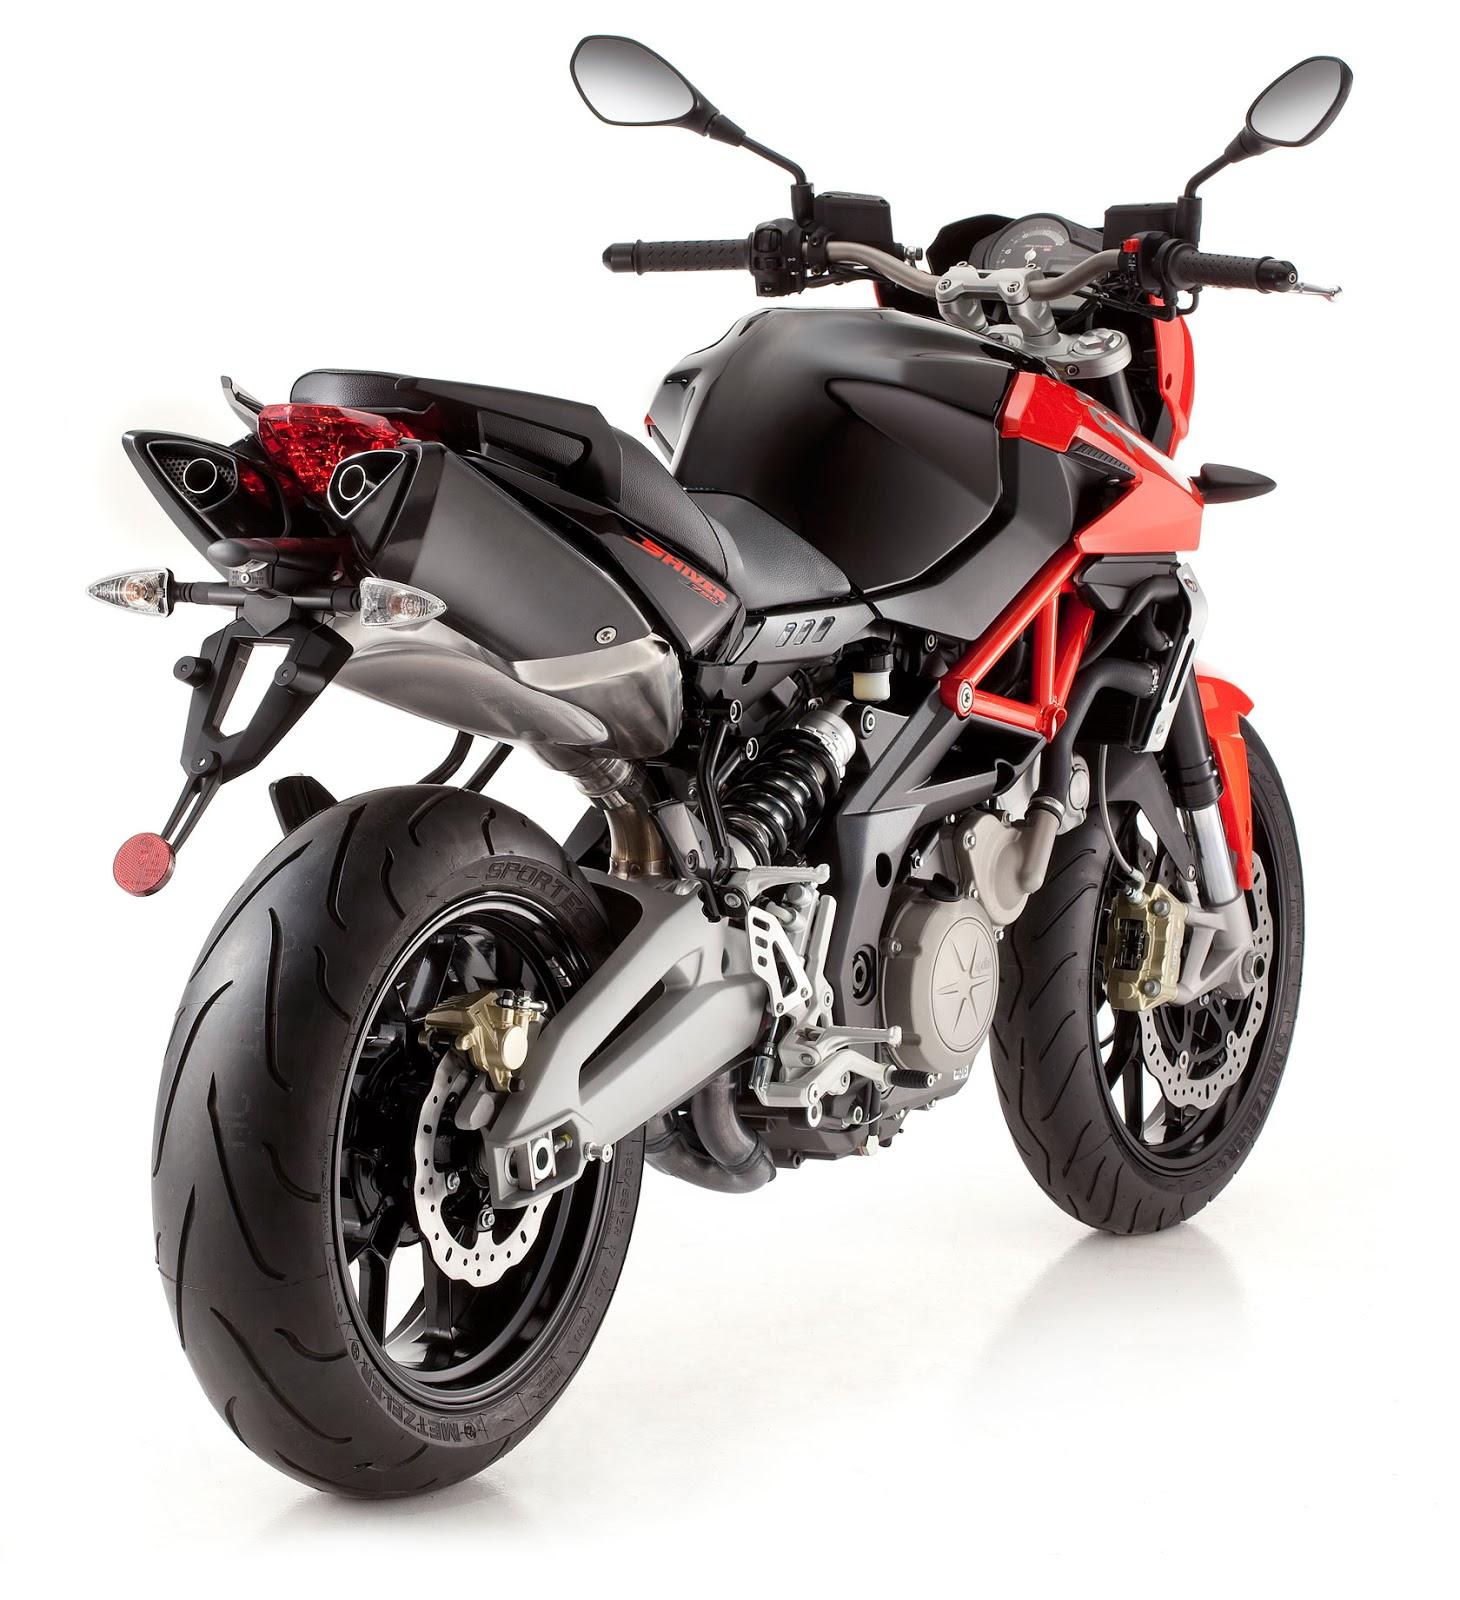 2013 Aprilia Shiver 750 | Latest Motorcycle Models